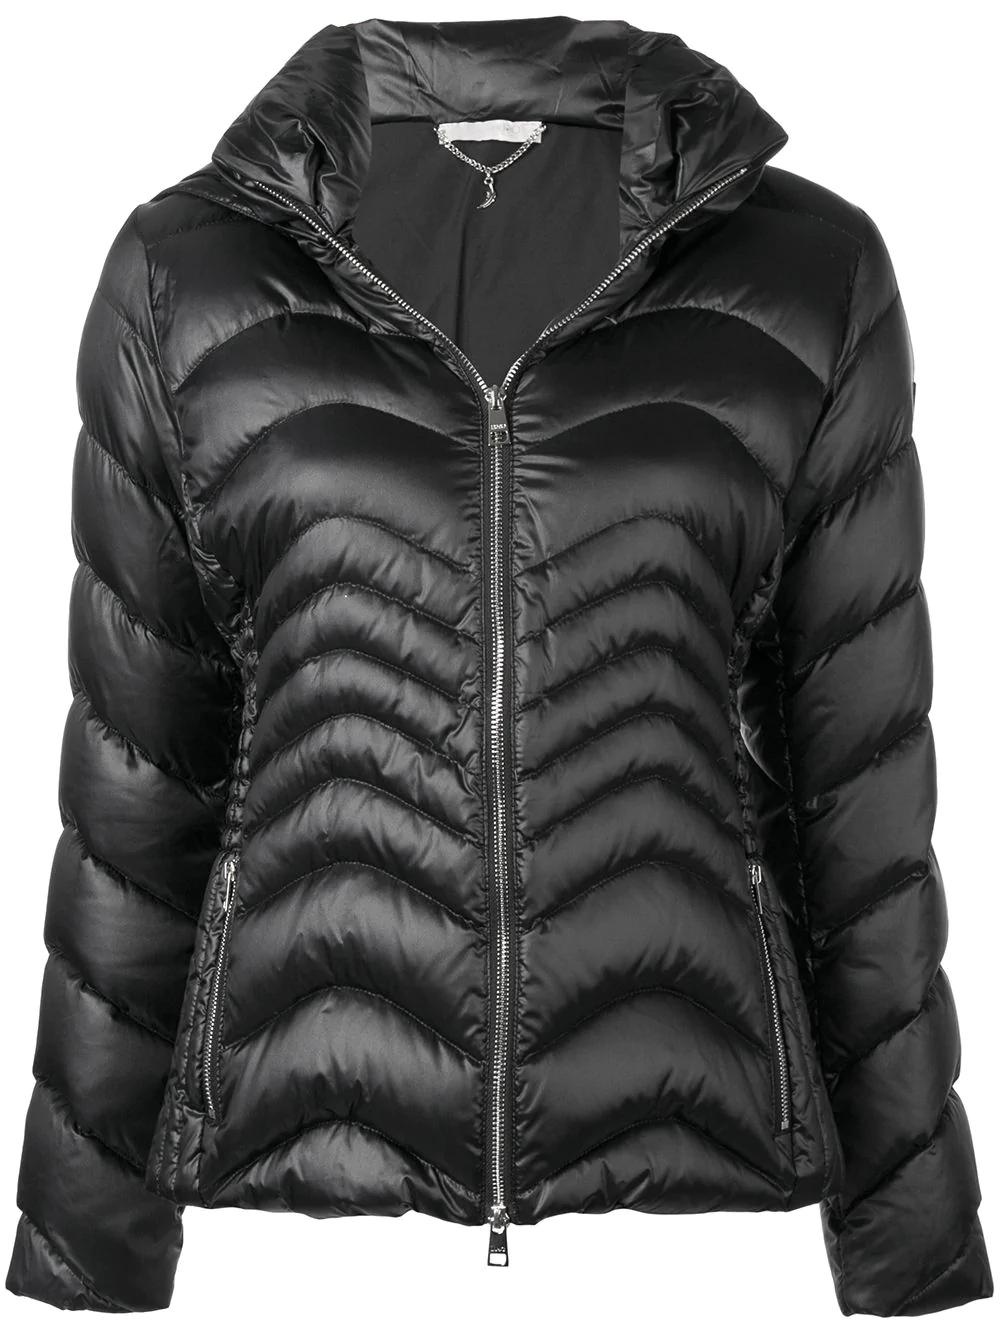 6f51854e8a Liu •Jo Liu Jo Hooded Puffer Jacket - Black. SIZE & FIT INFORMATION